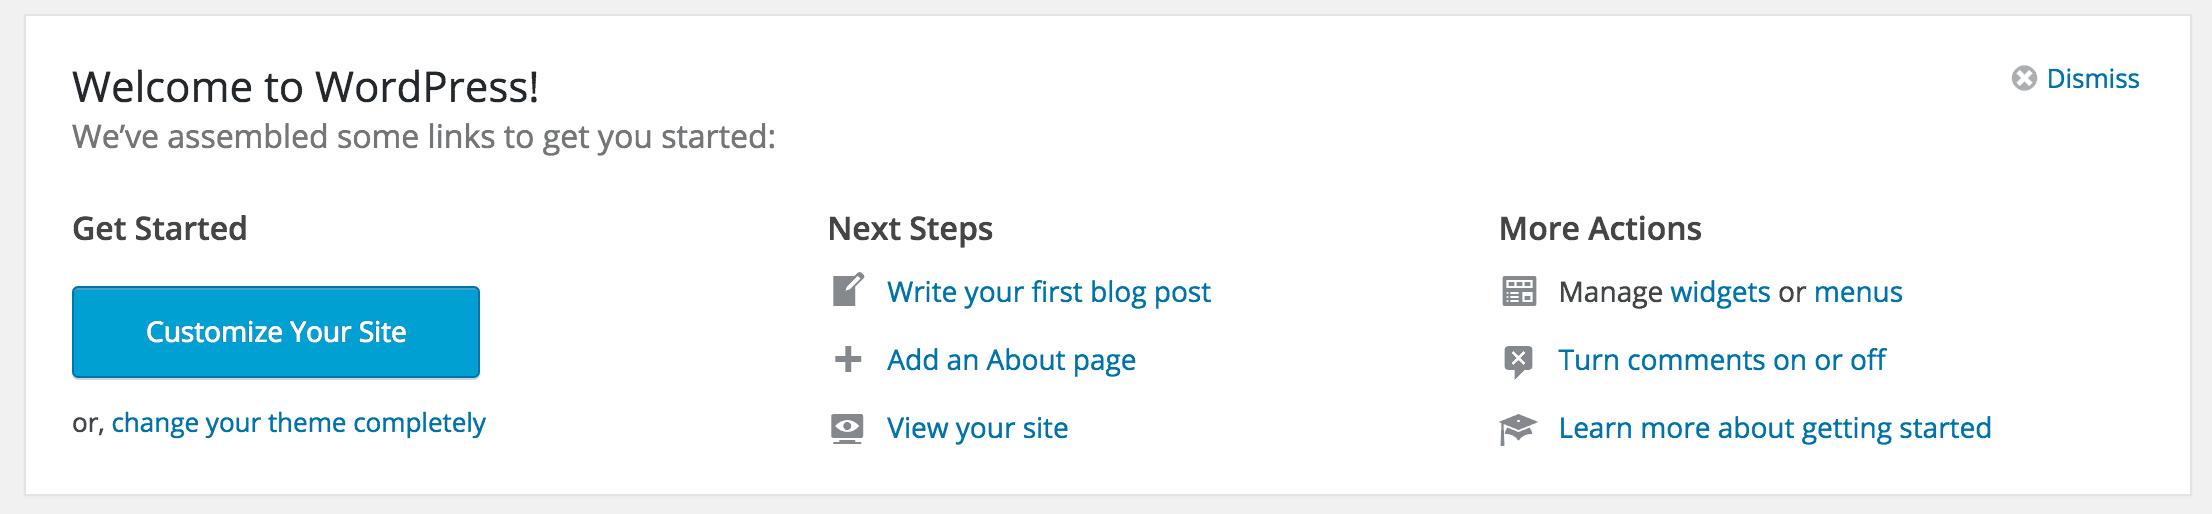 getting started blogging